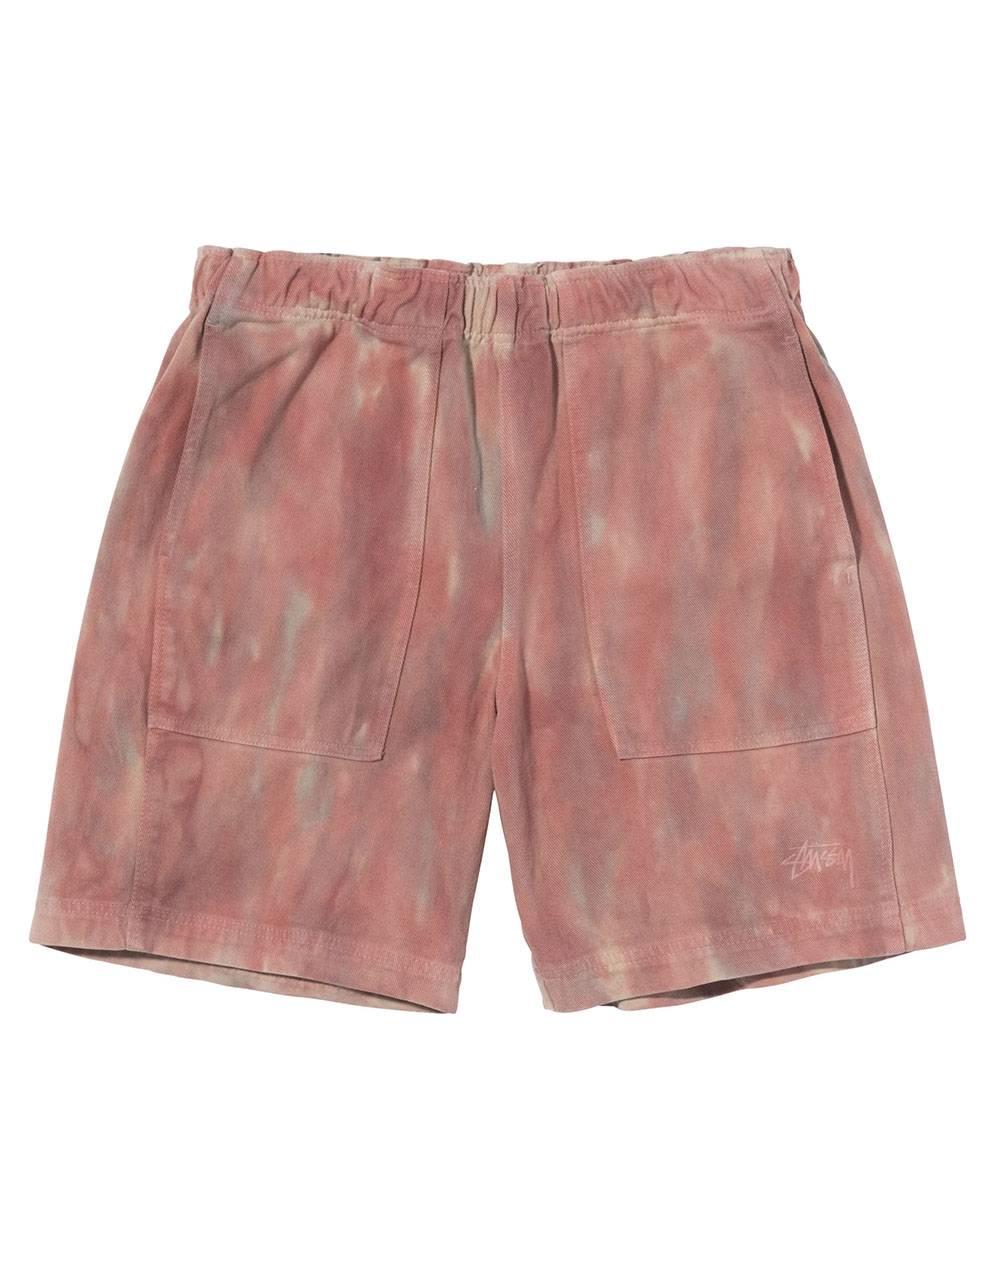 Stussy Dyed easy shorts - rust Stussy Shorts 129,00€